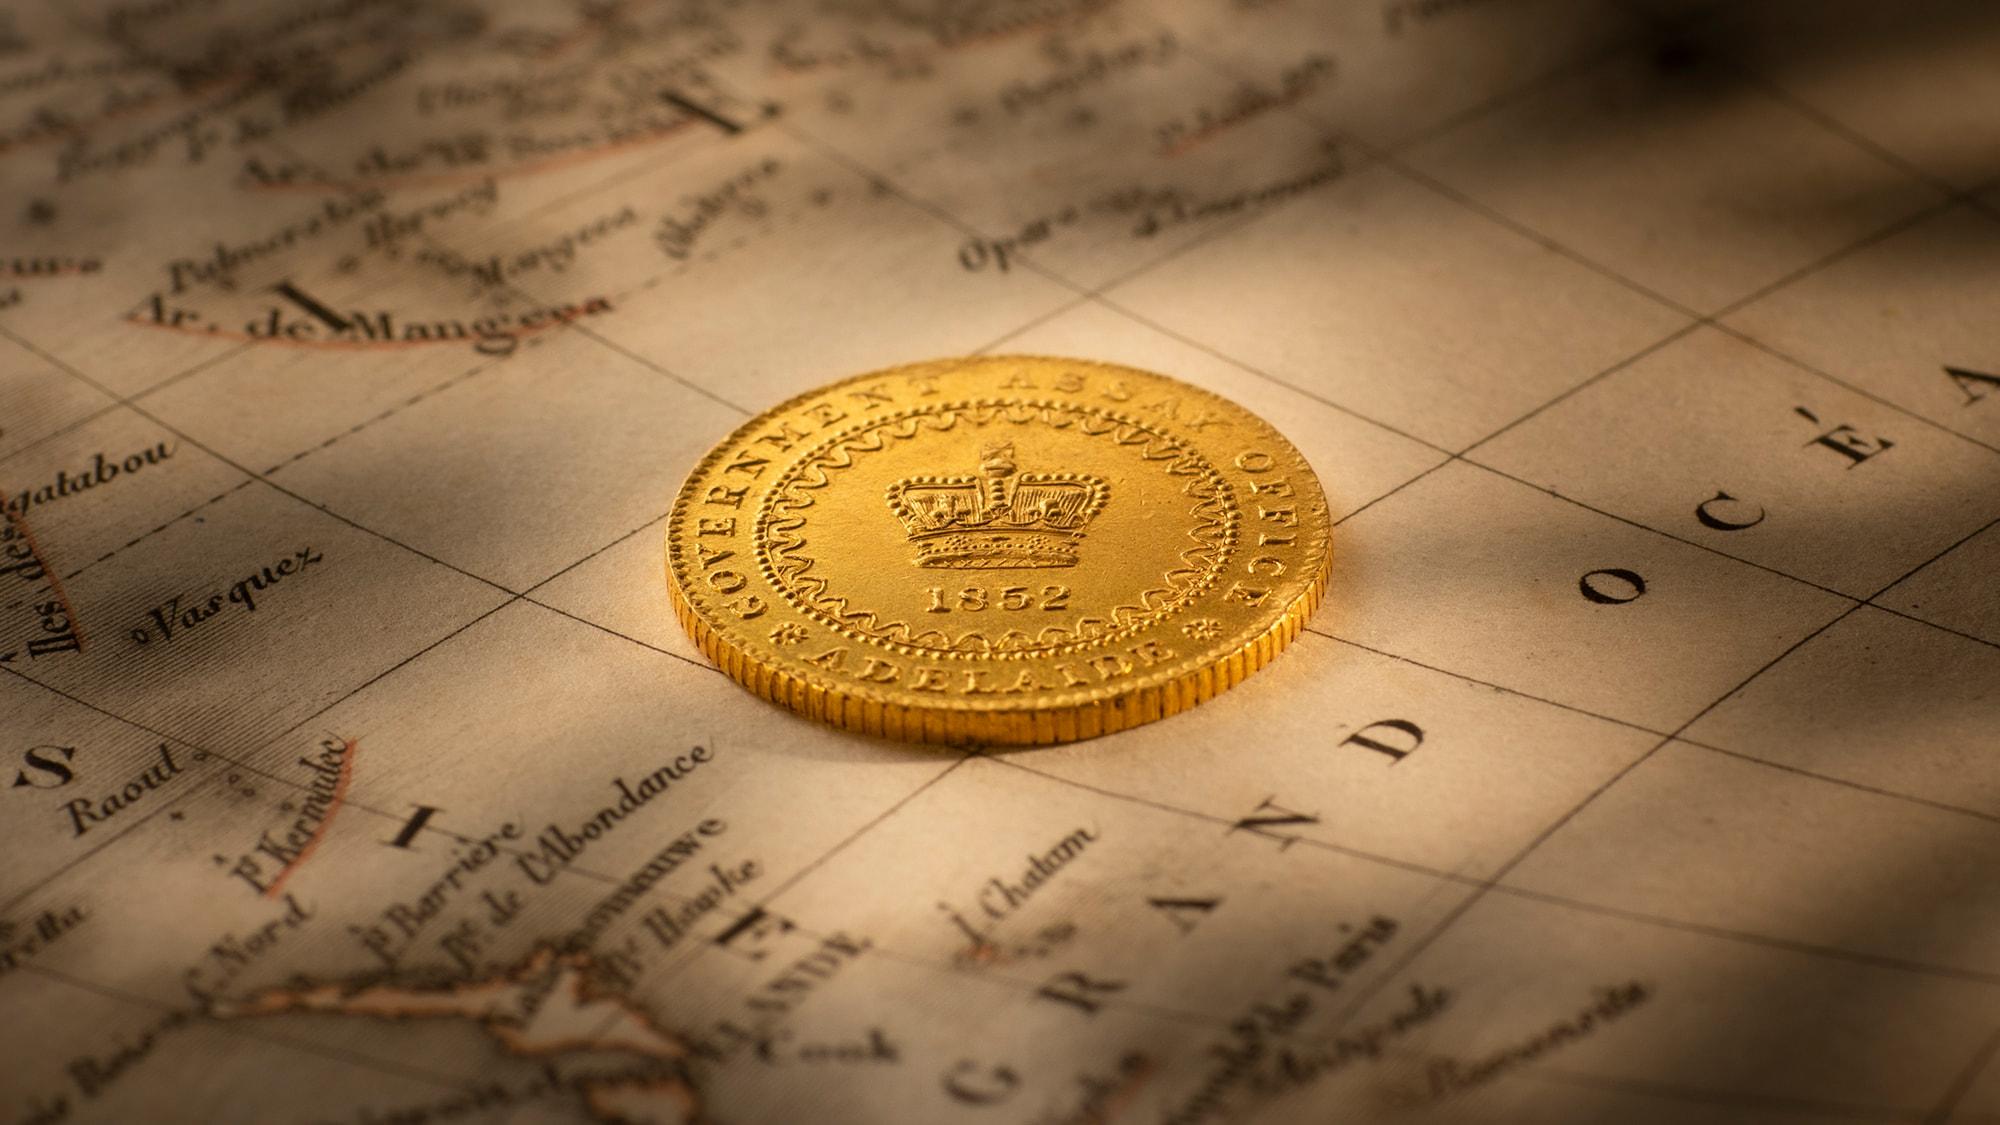 1852-Adelaide-Pound-nr-Unc-Rev-July-2020